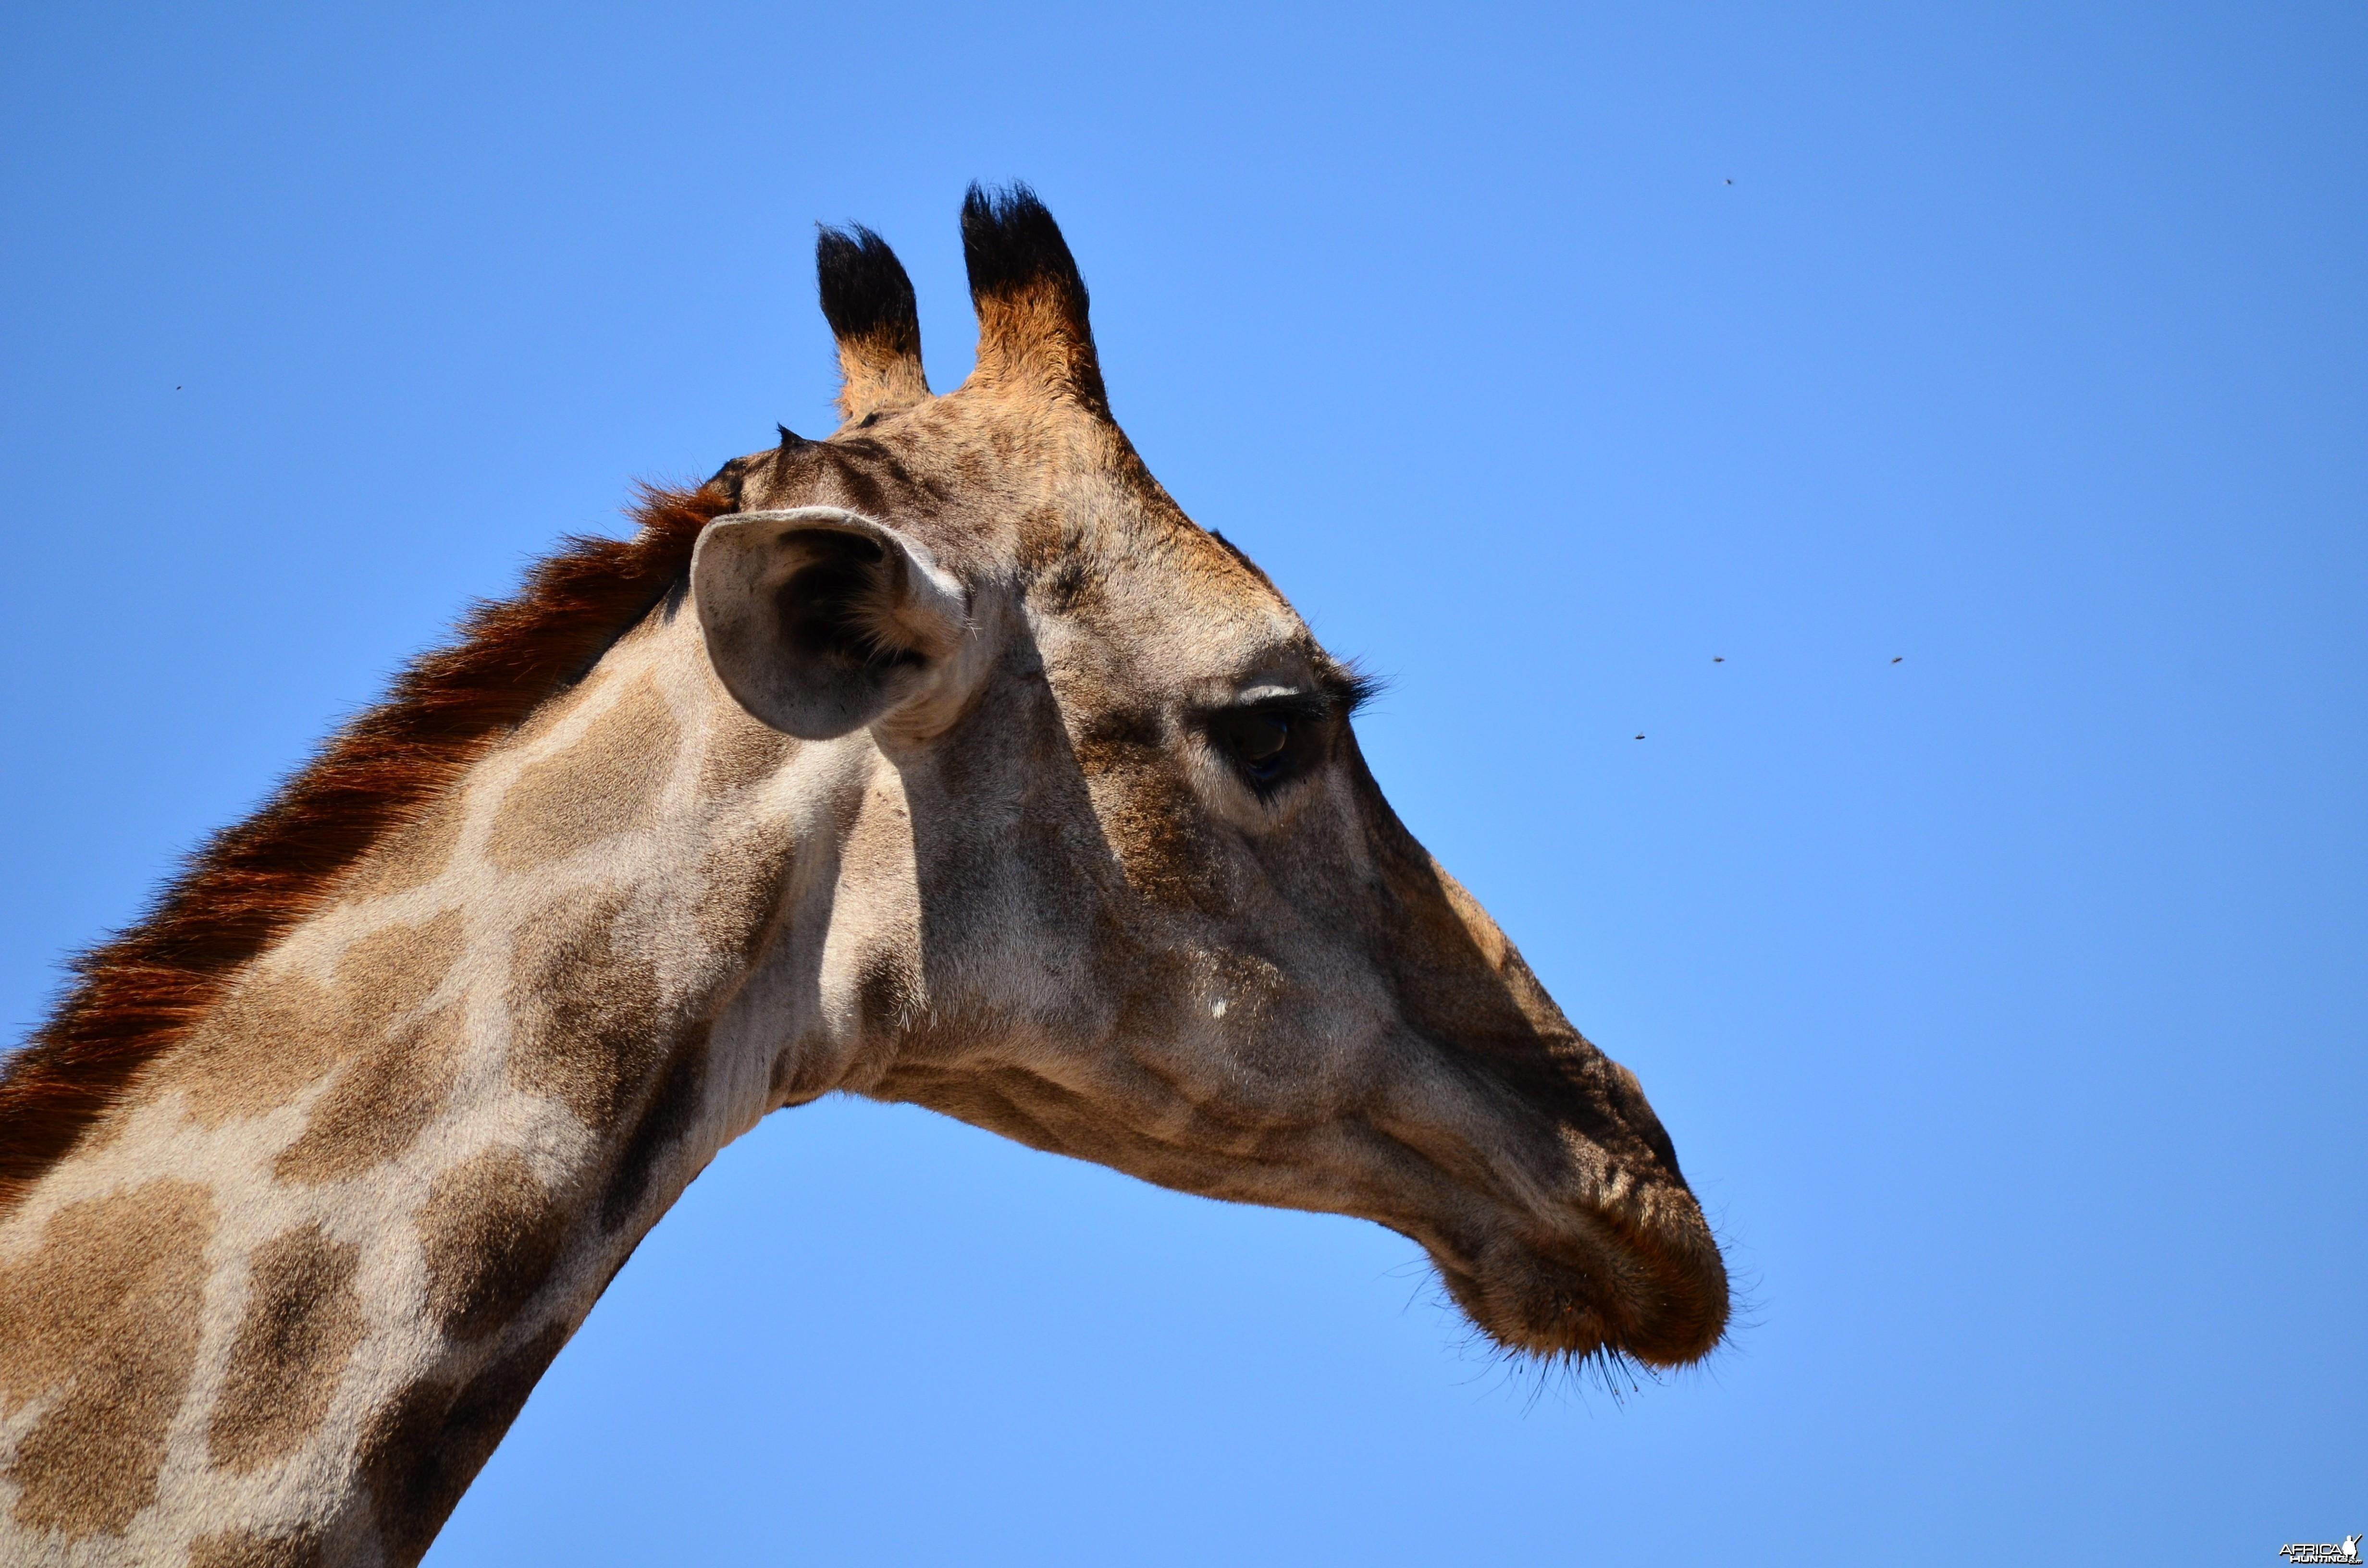 giraffe - Mylpaal